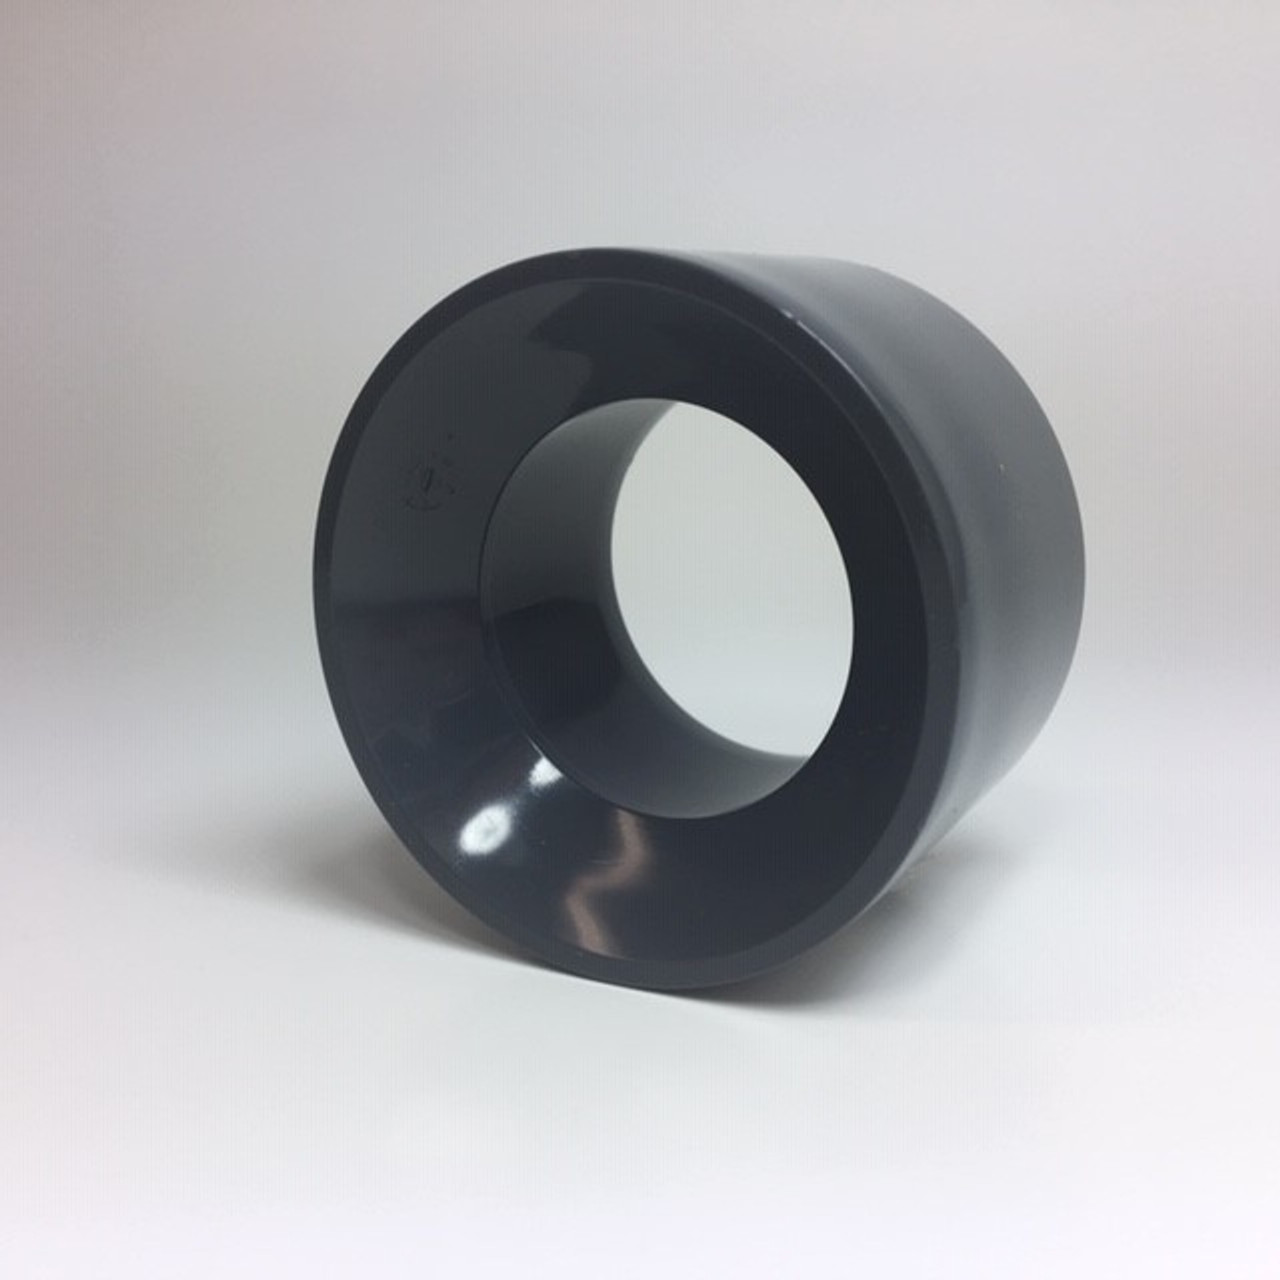 +GF+ | Reducing Bushes Short PVC-U 63-50mm (721900358)